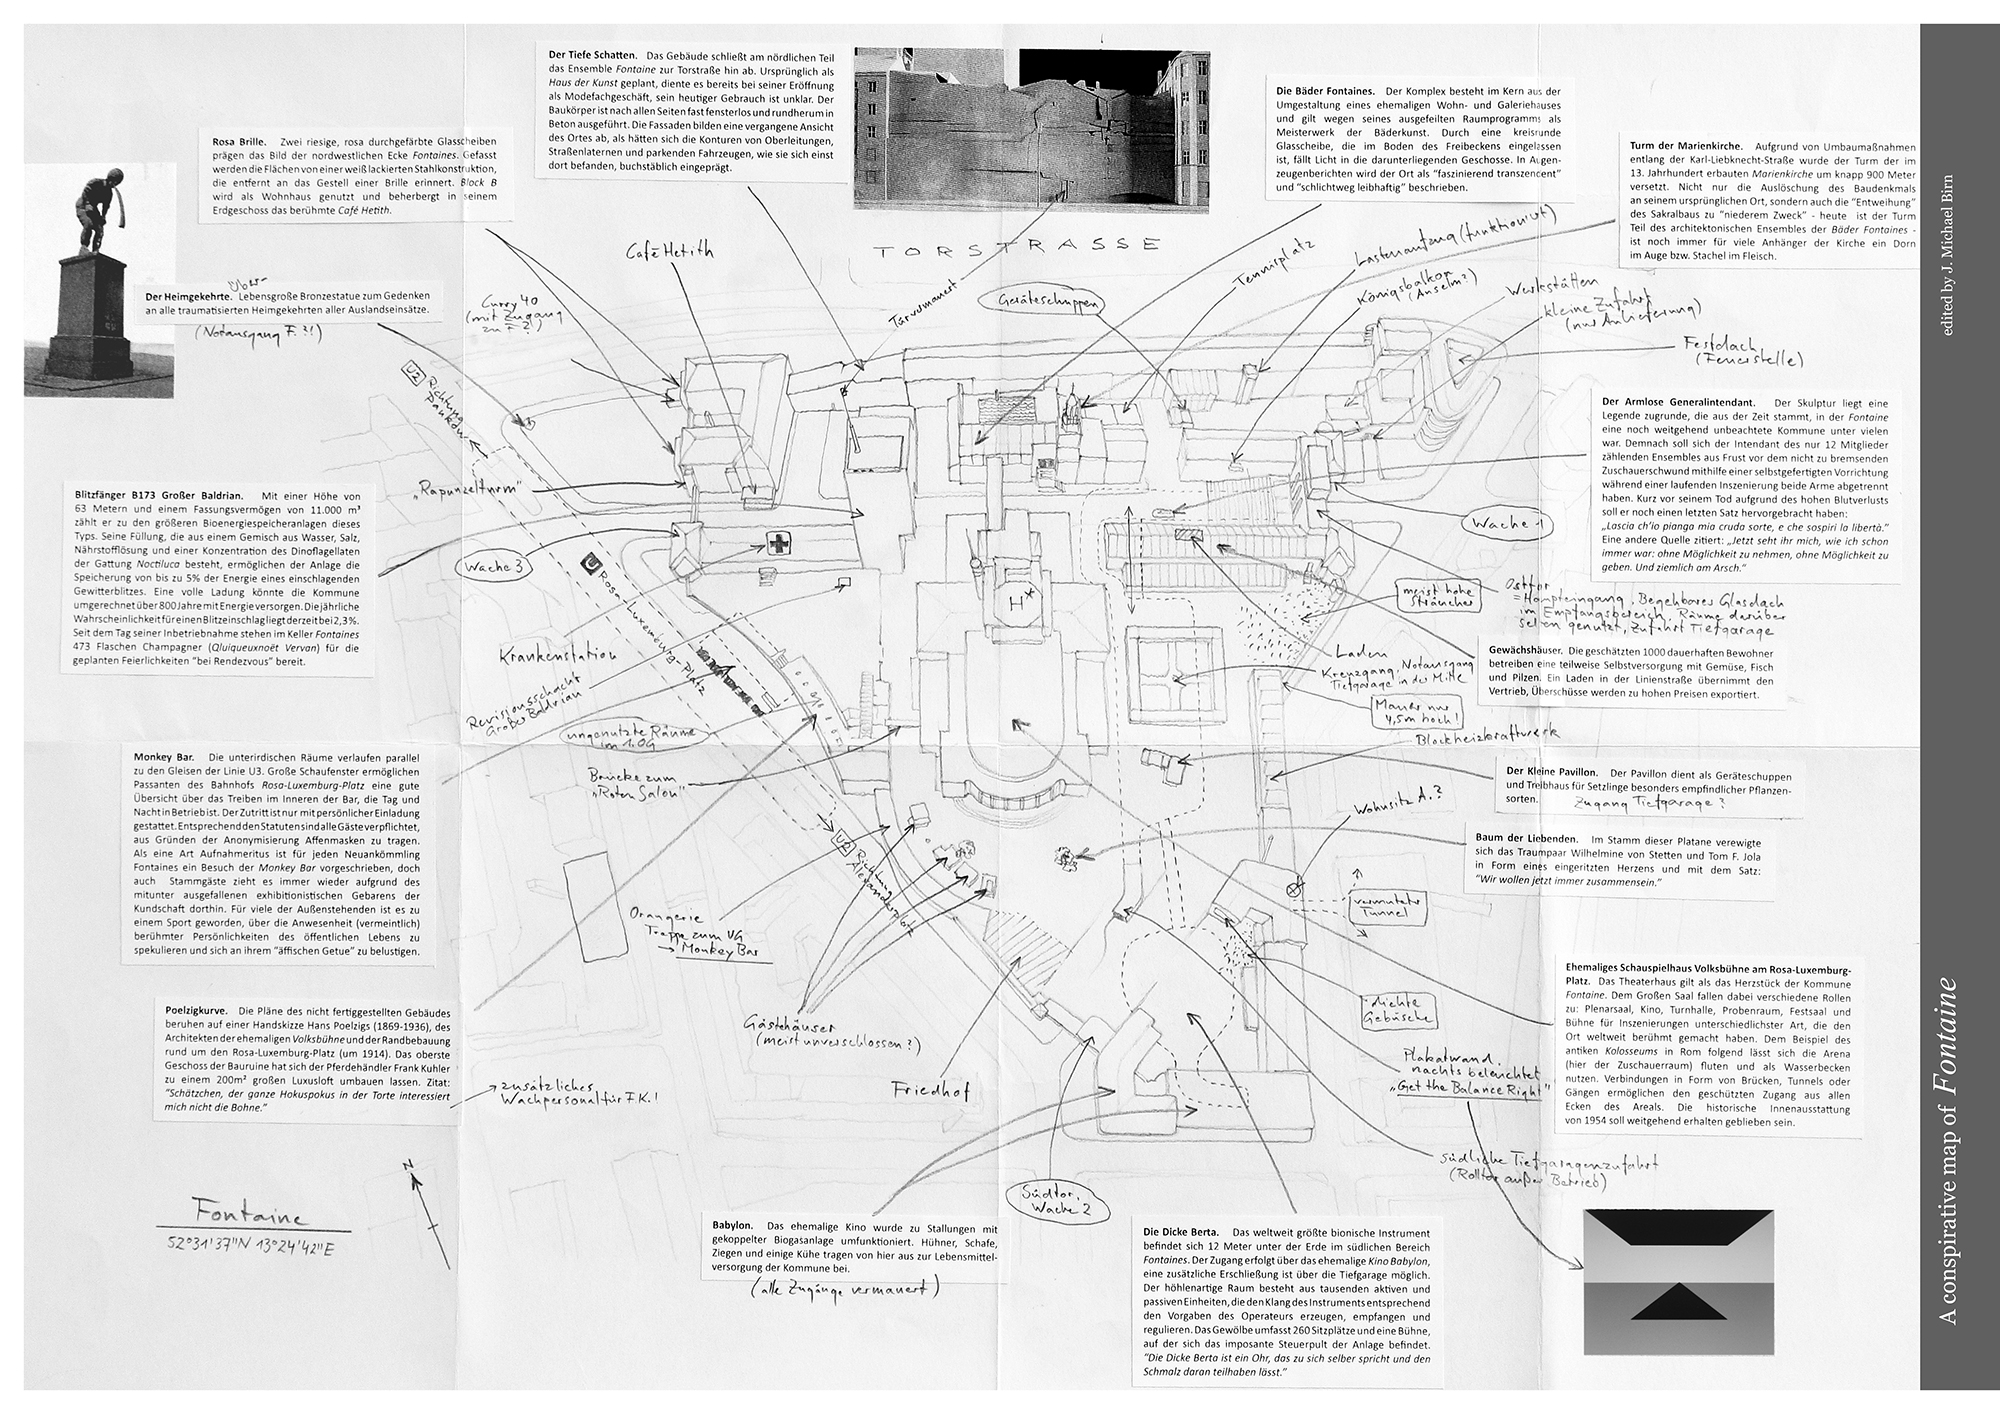 NFAM_Conspirative Map